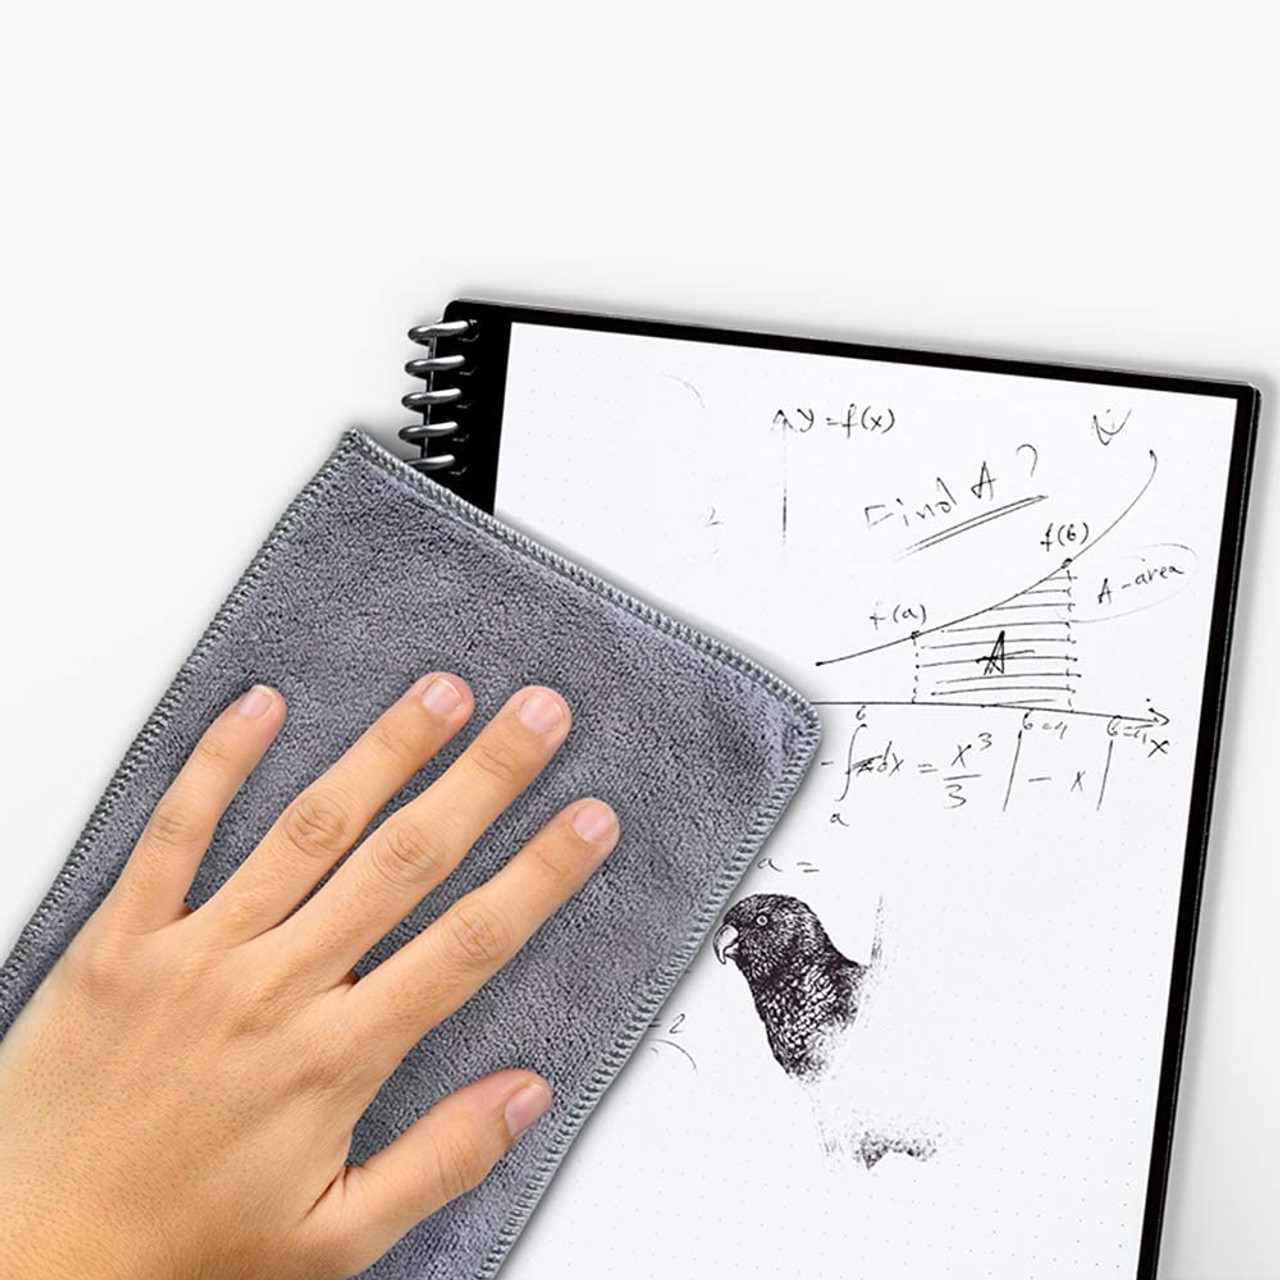 Rocketbook EVRF-E-K-CDF Fusion Smart Reusable Notebook with Pen and Microfiber Cloth, Executive Size, Dark Blue